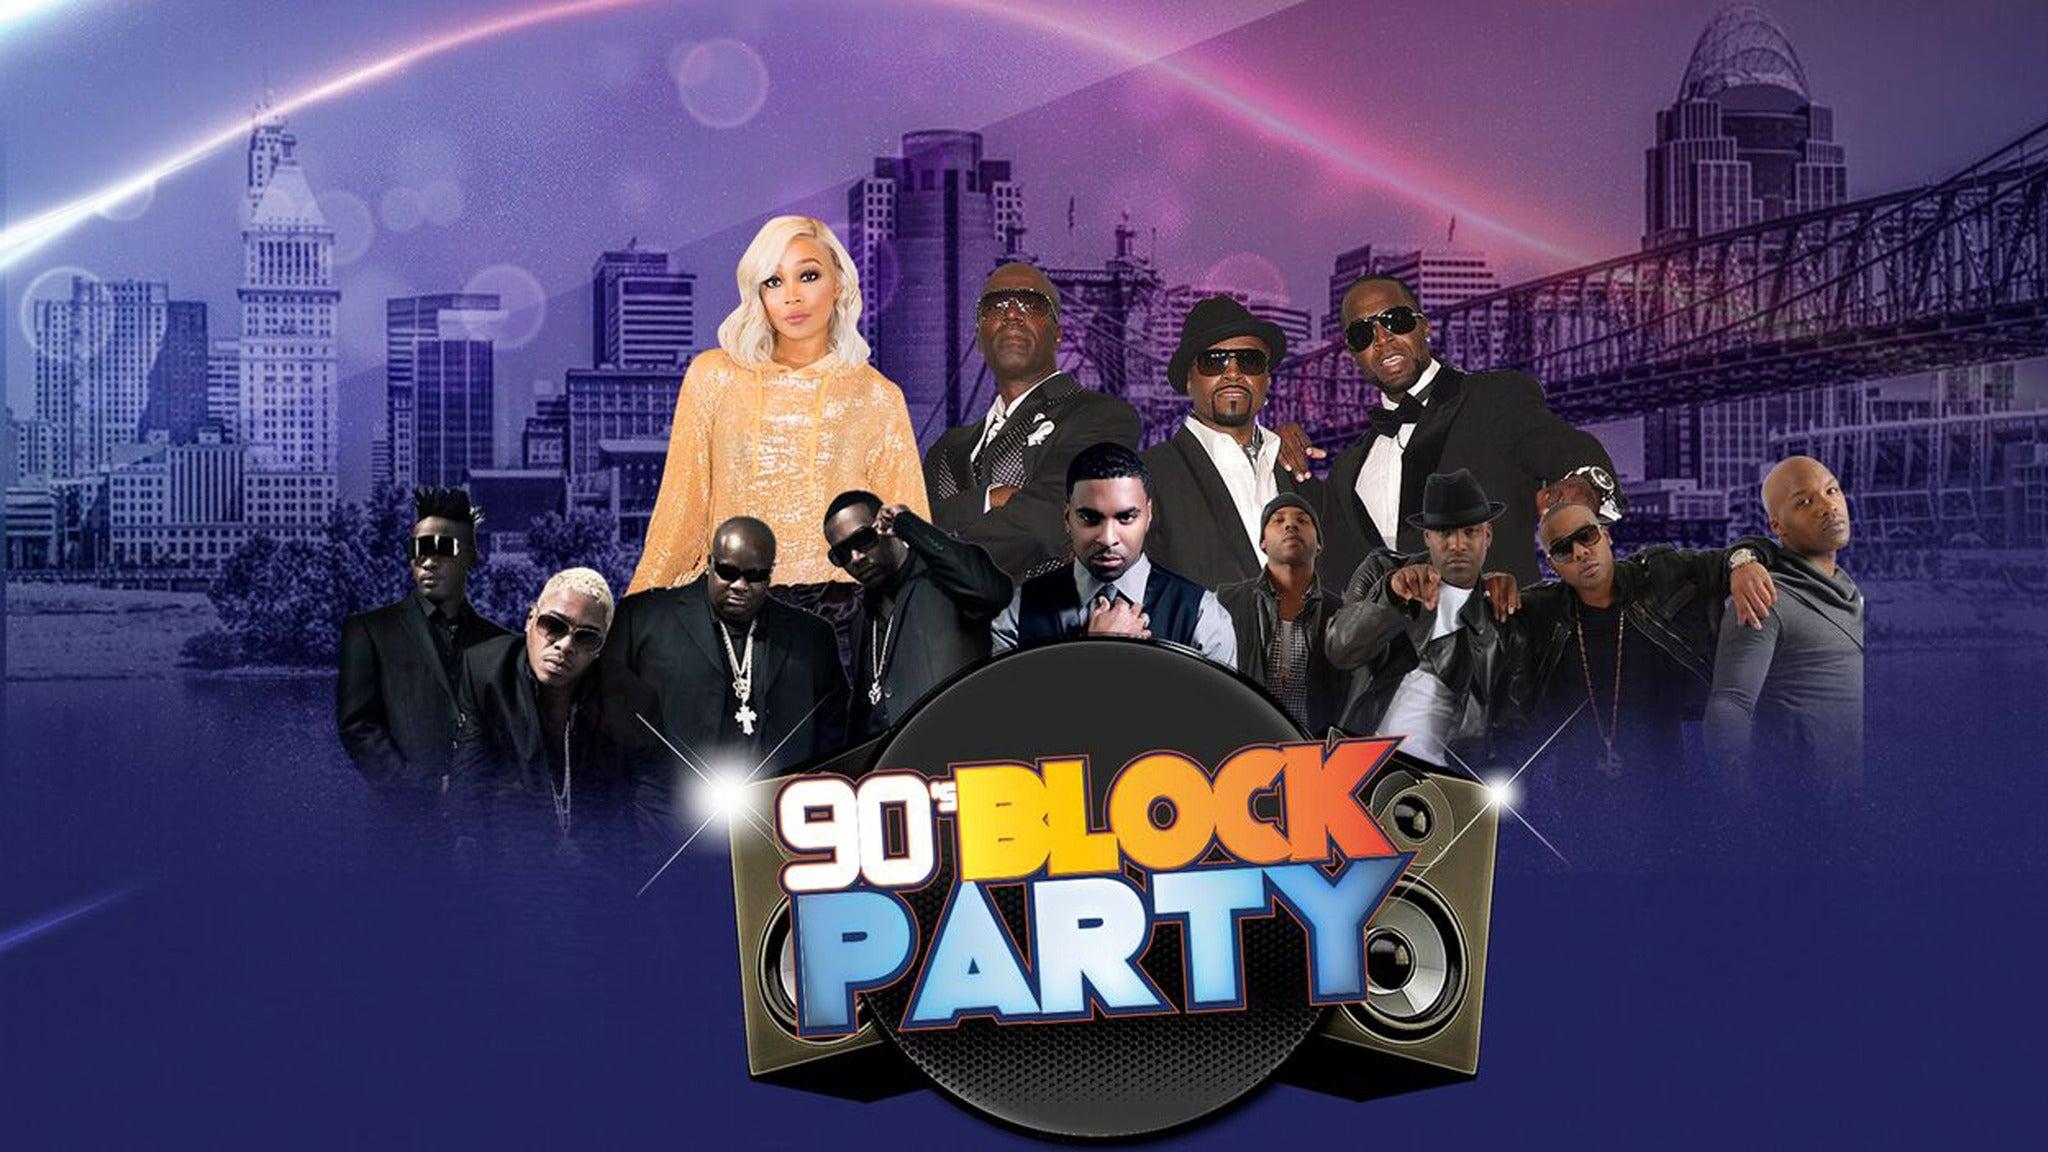 Cincinnati 90's Block Party